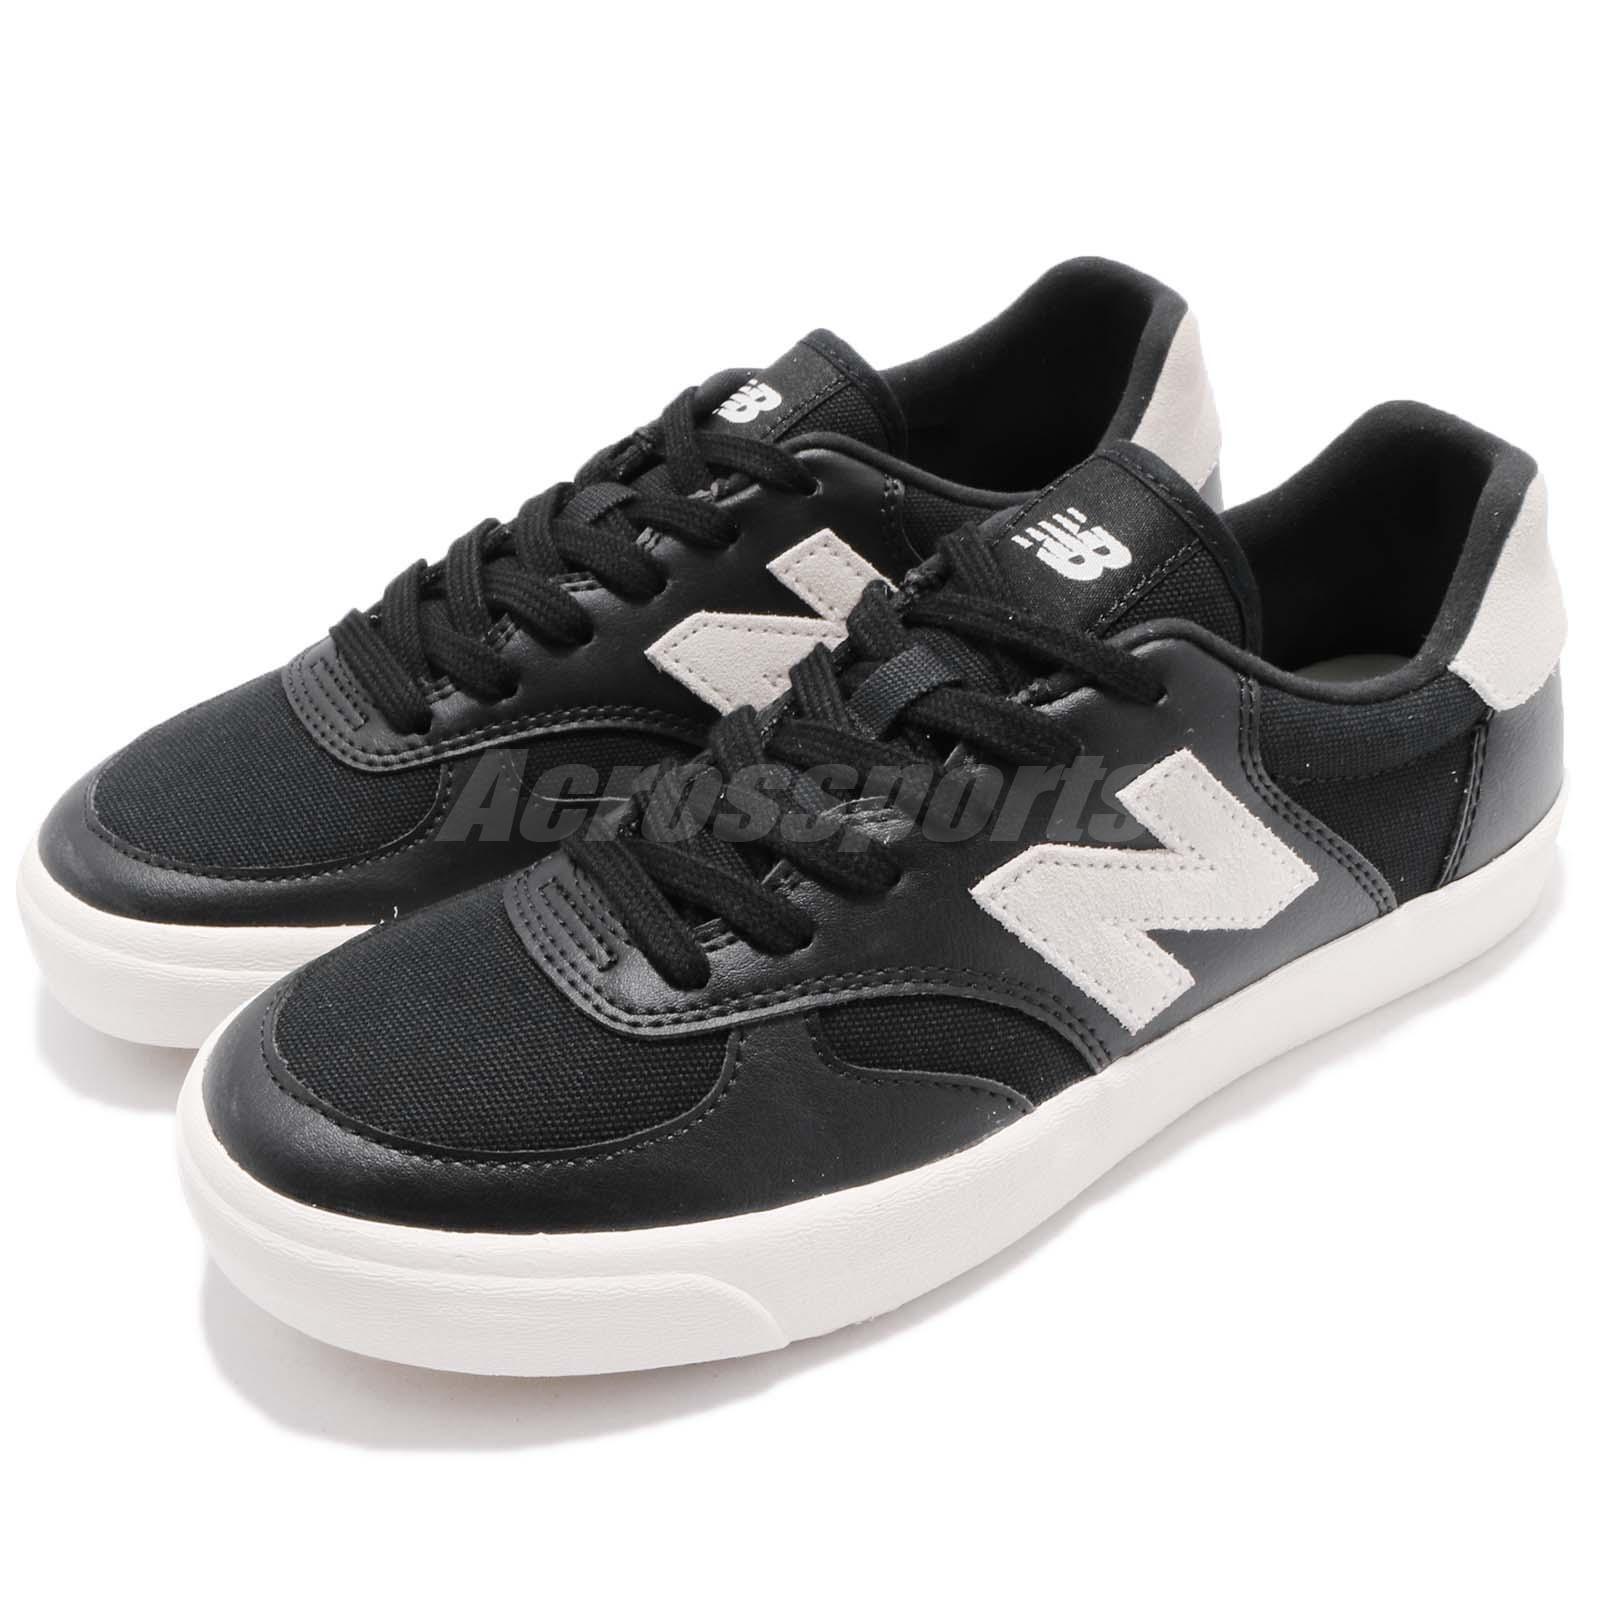 New Balance CRT300XB D Court noir Ivory hommes Chaussures Sneakers CRT300XBD